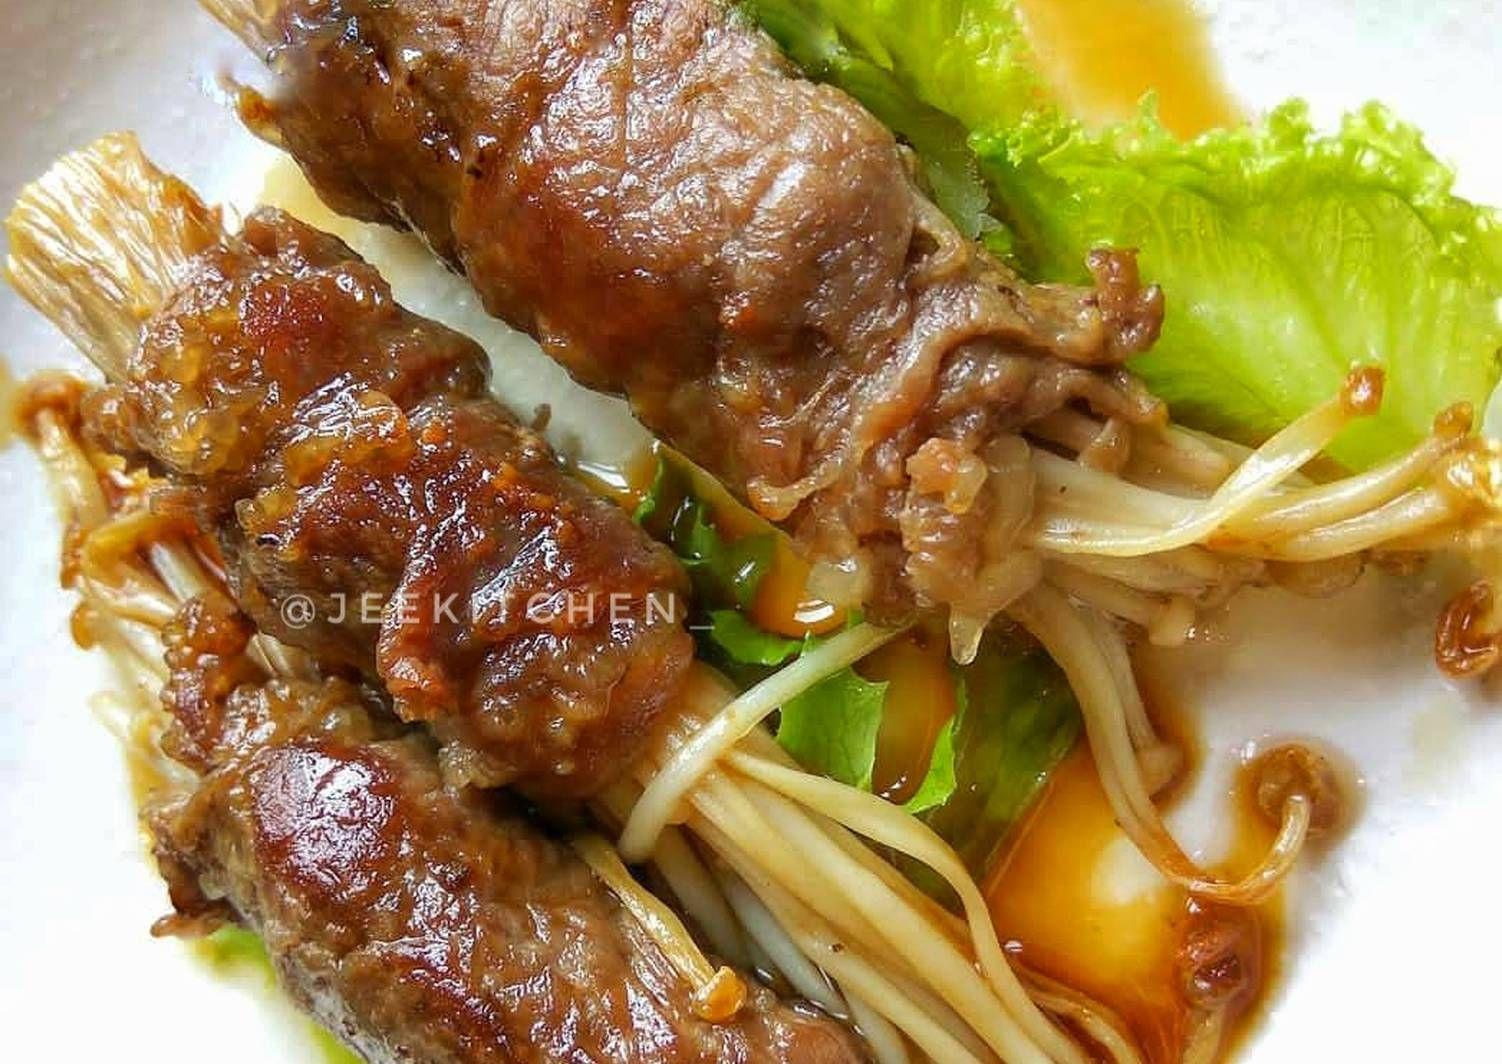 Resep Enoki Beef Rolls Daging Gulung Jamur Enoki Oleh Jeje Jeekitchen Resep Roti Gulung Jamur Daging